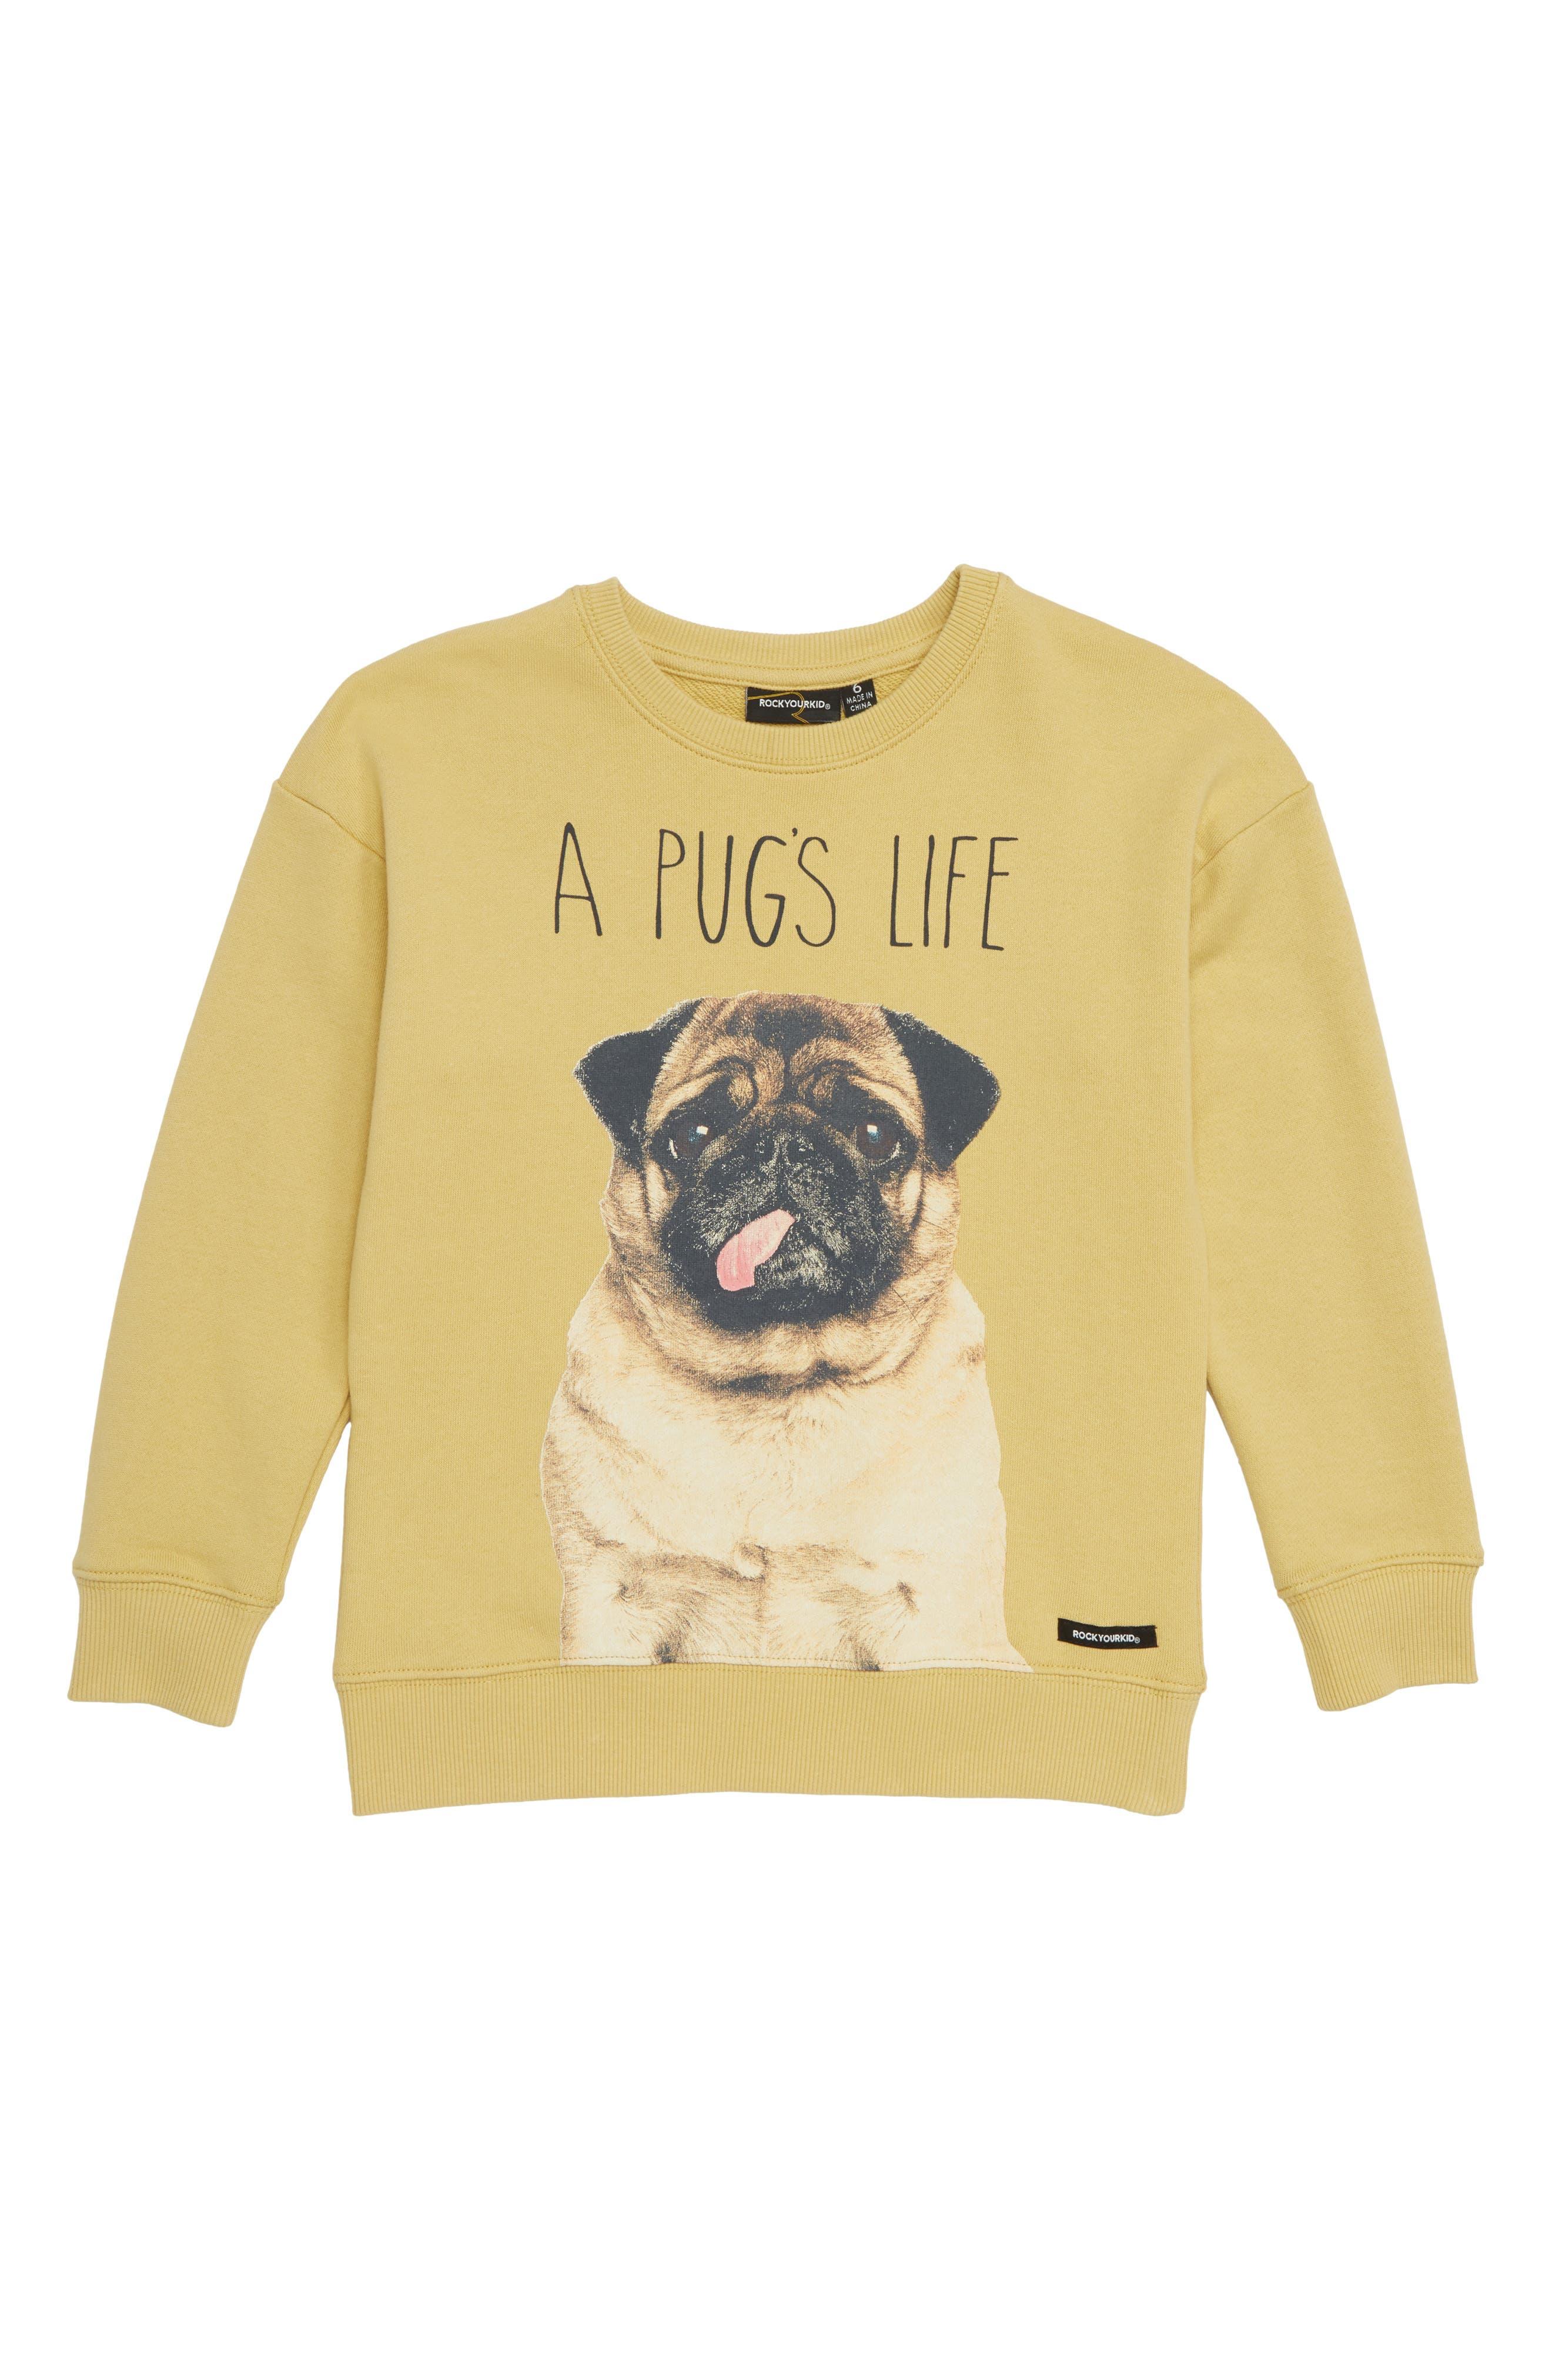 A Pug's Life Sweatshirt,                         Main,                         color, 250